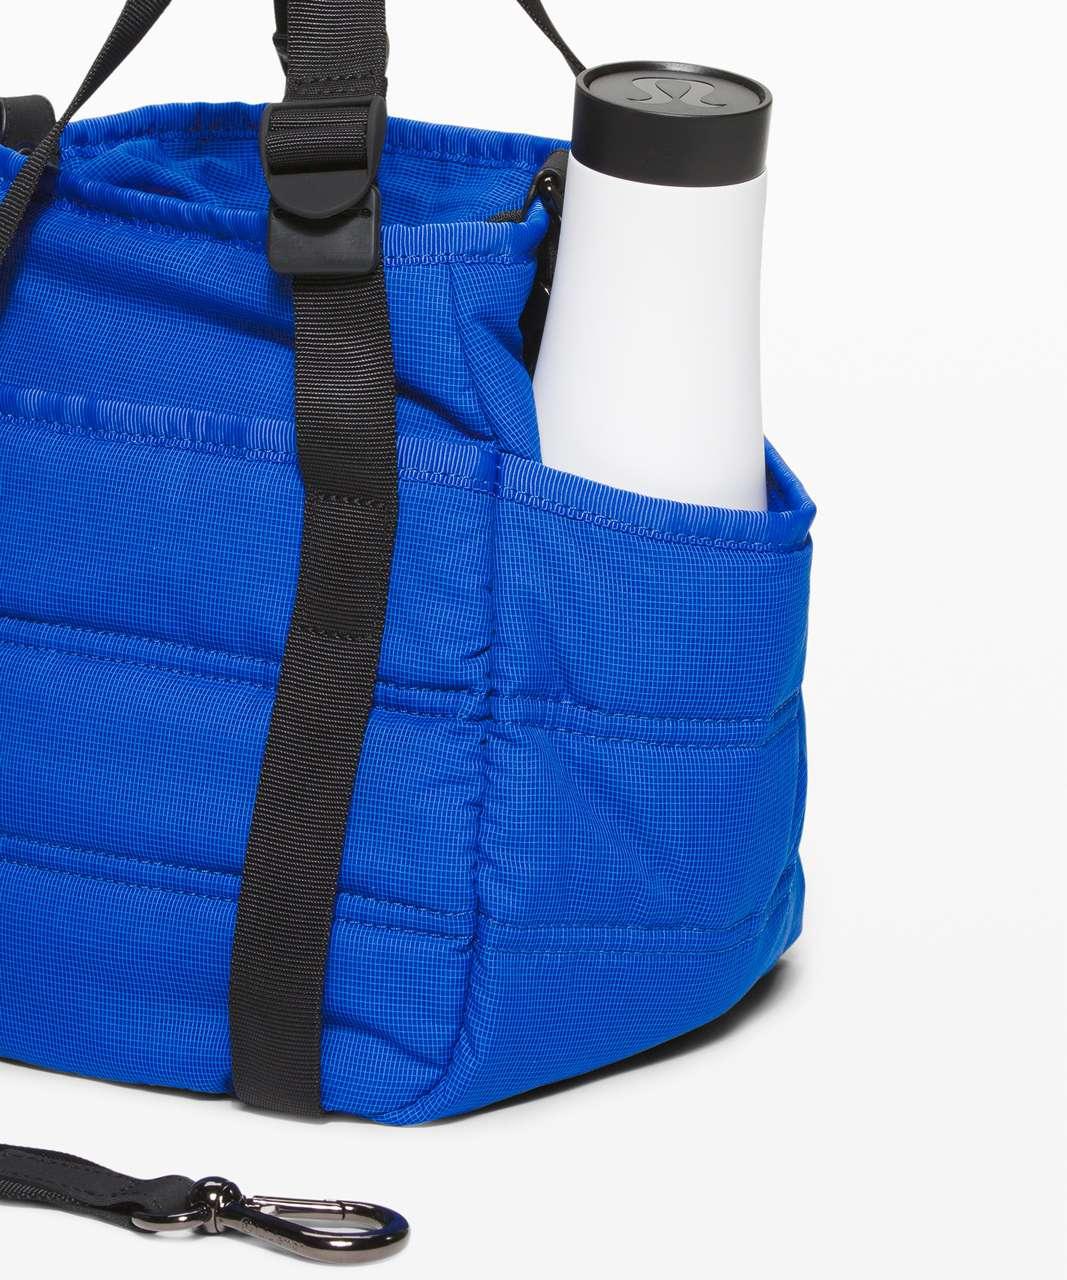 Lululemon Dash All Day Bucket Bag *6.5L - Wild Bluebell